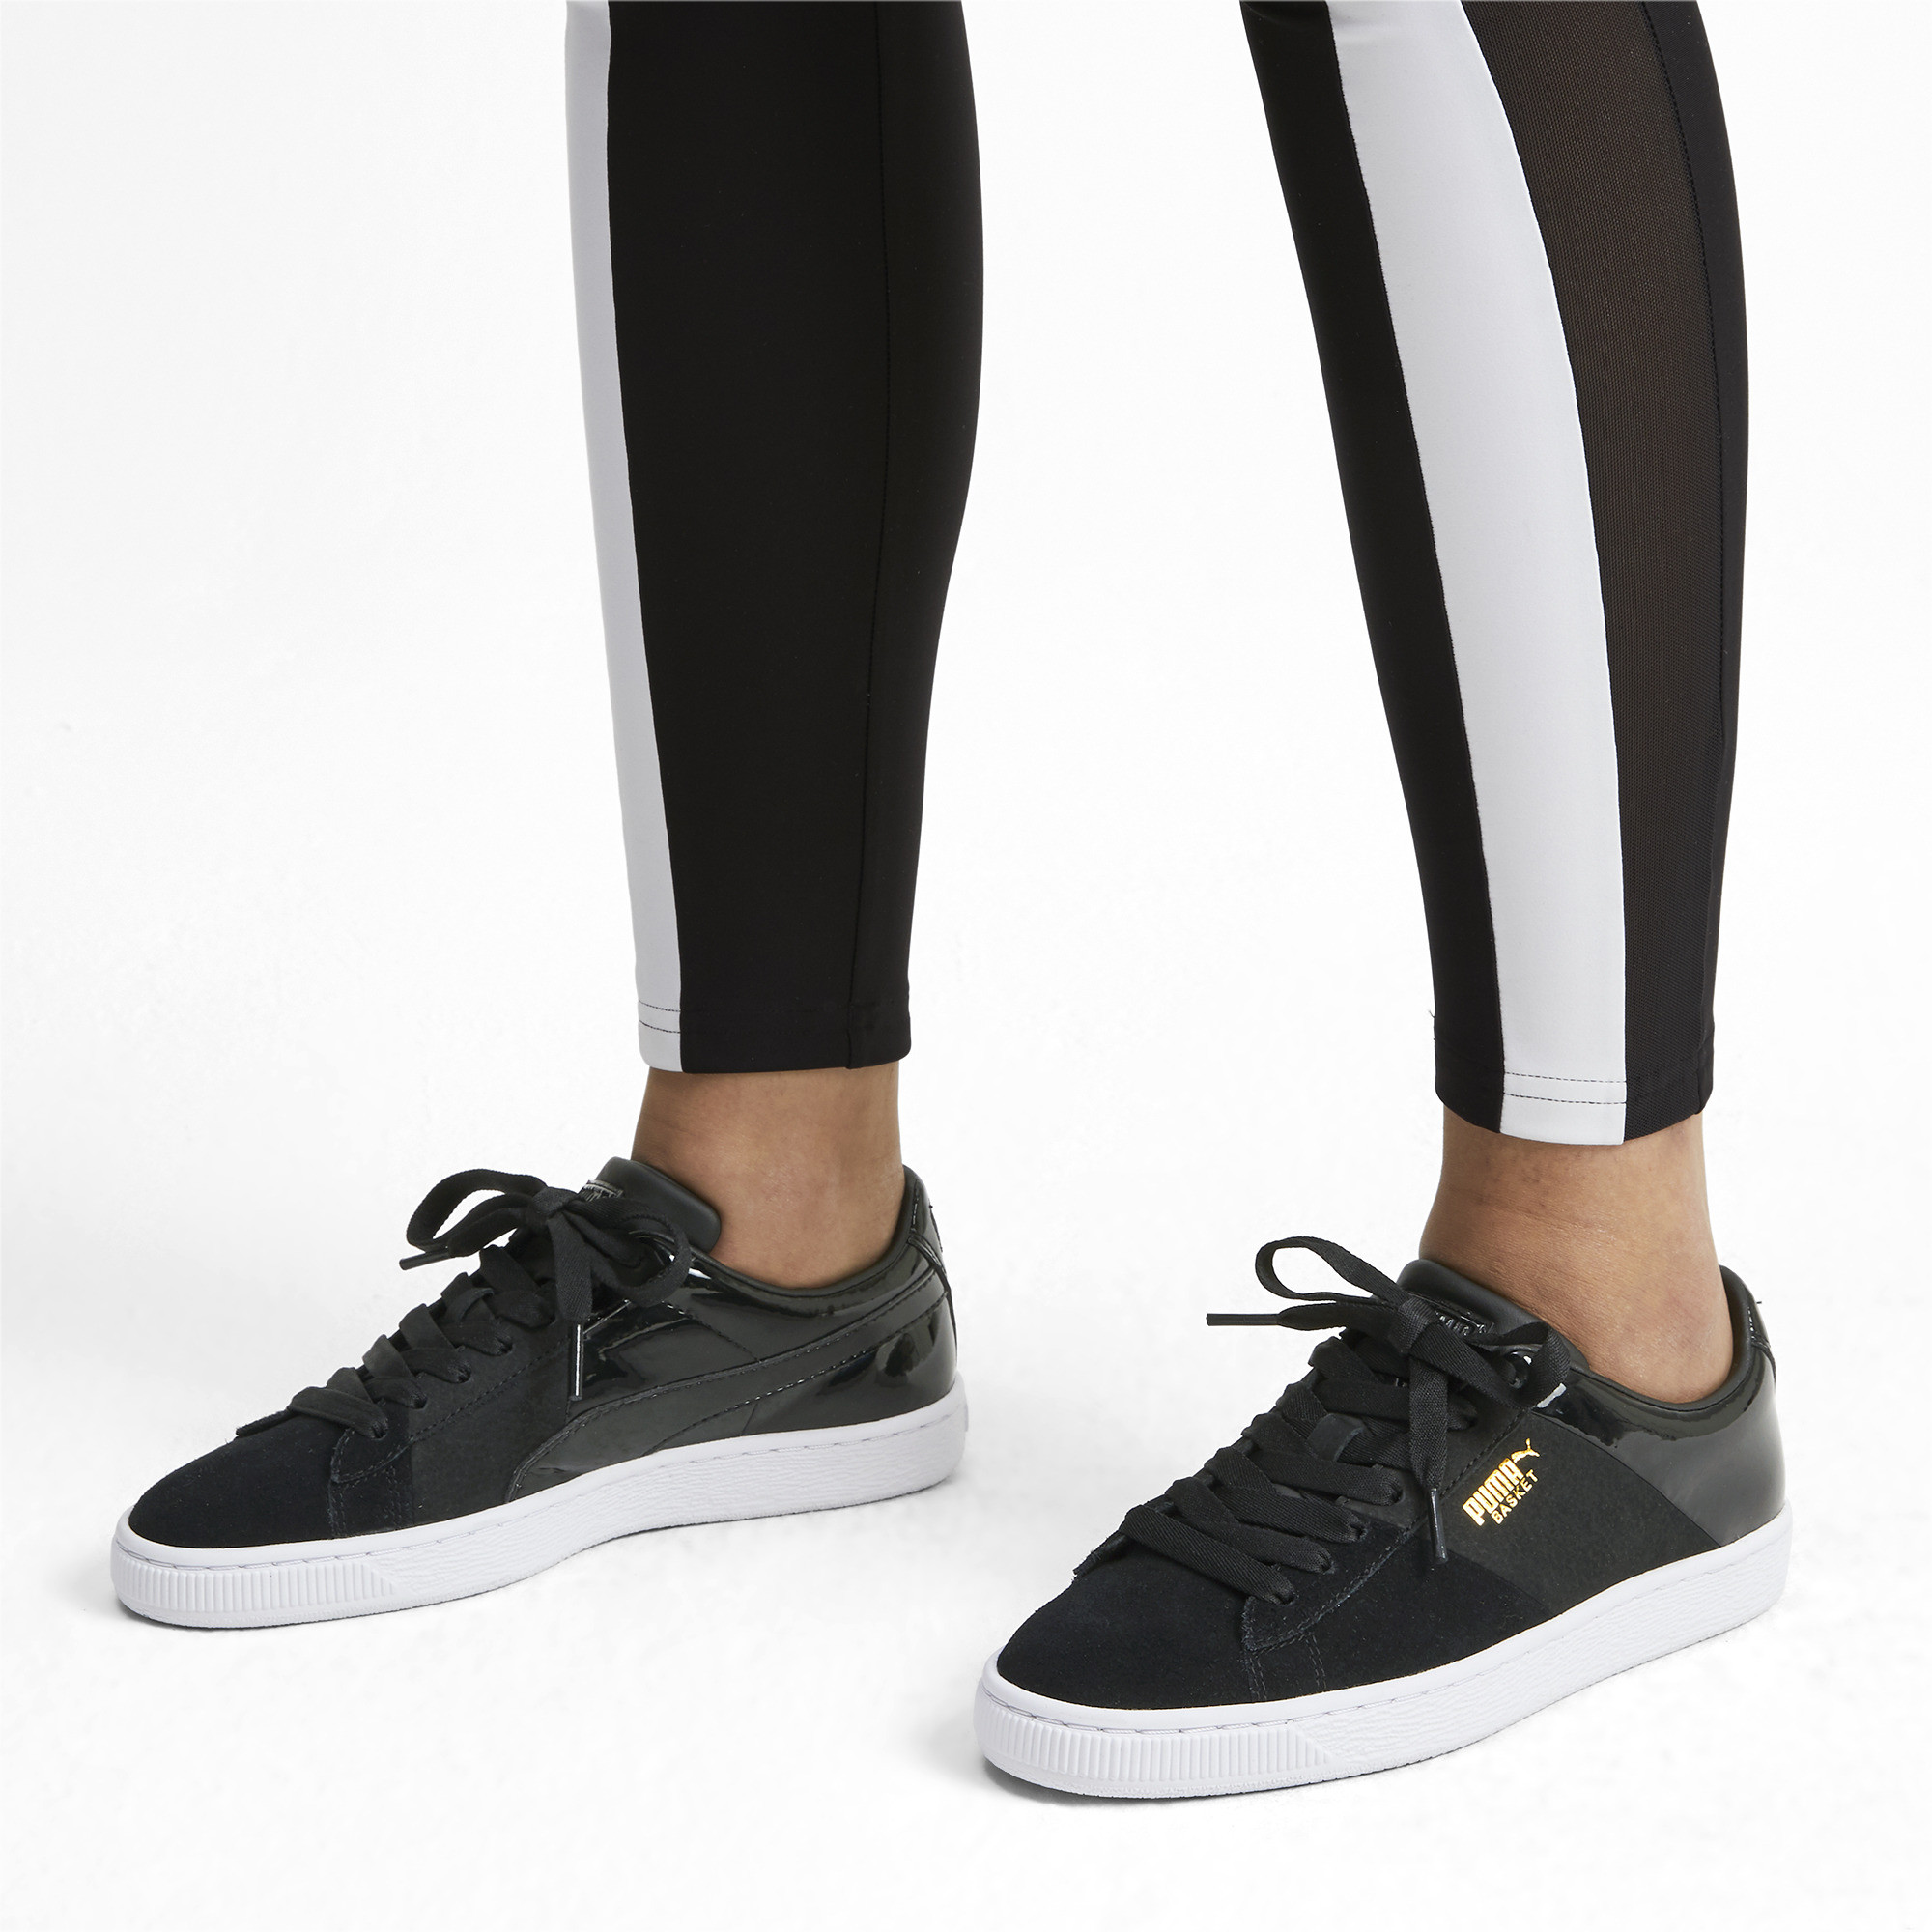 Details about PUMA Basket Remix Women's Sneakers Women Shoe Sport Classics